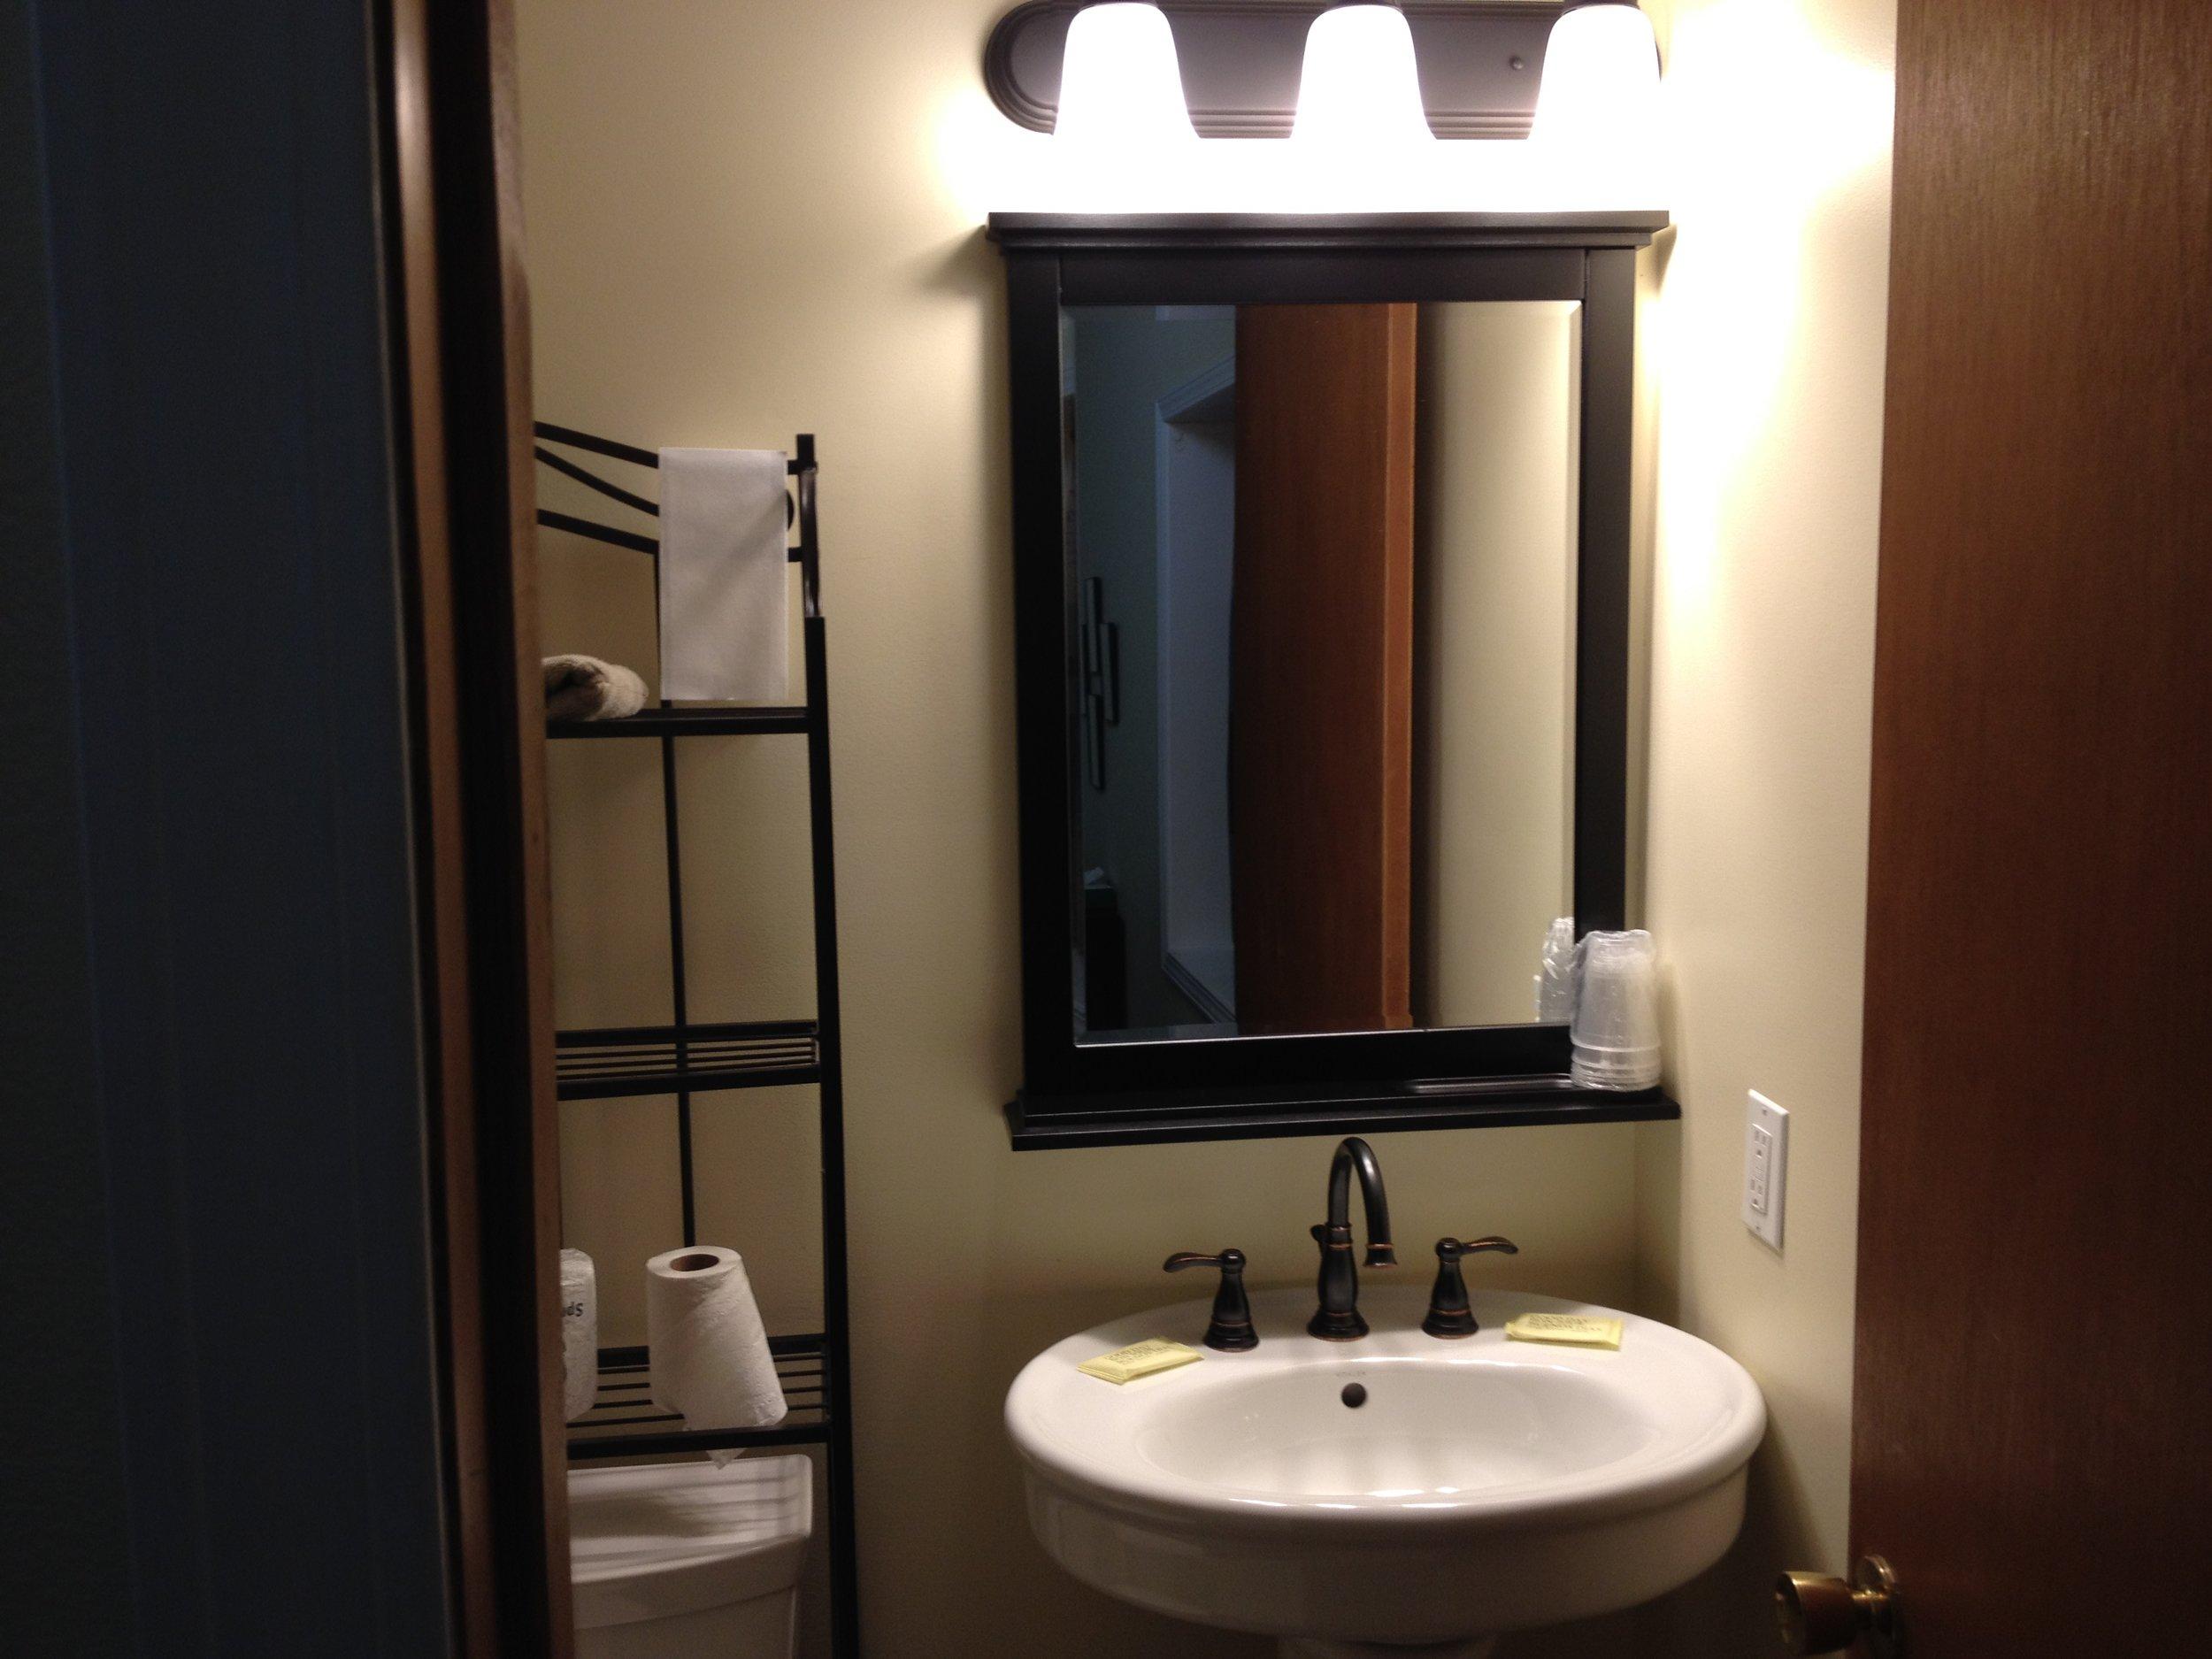 Room 101 - Special Guest Room - Bathroom